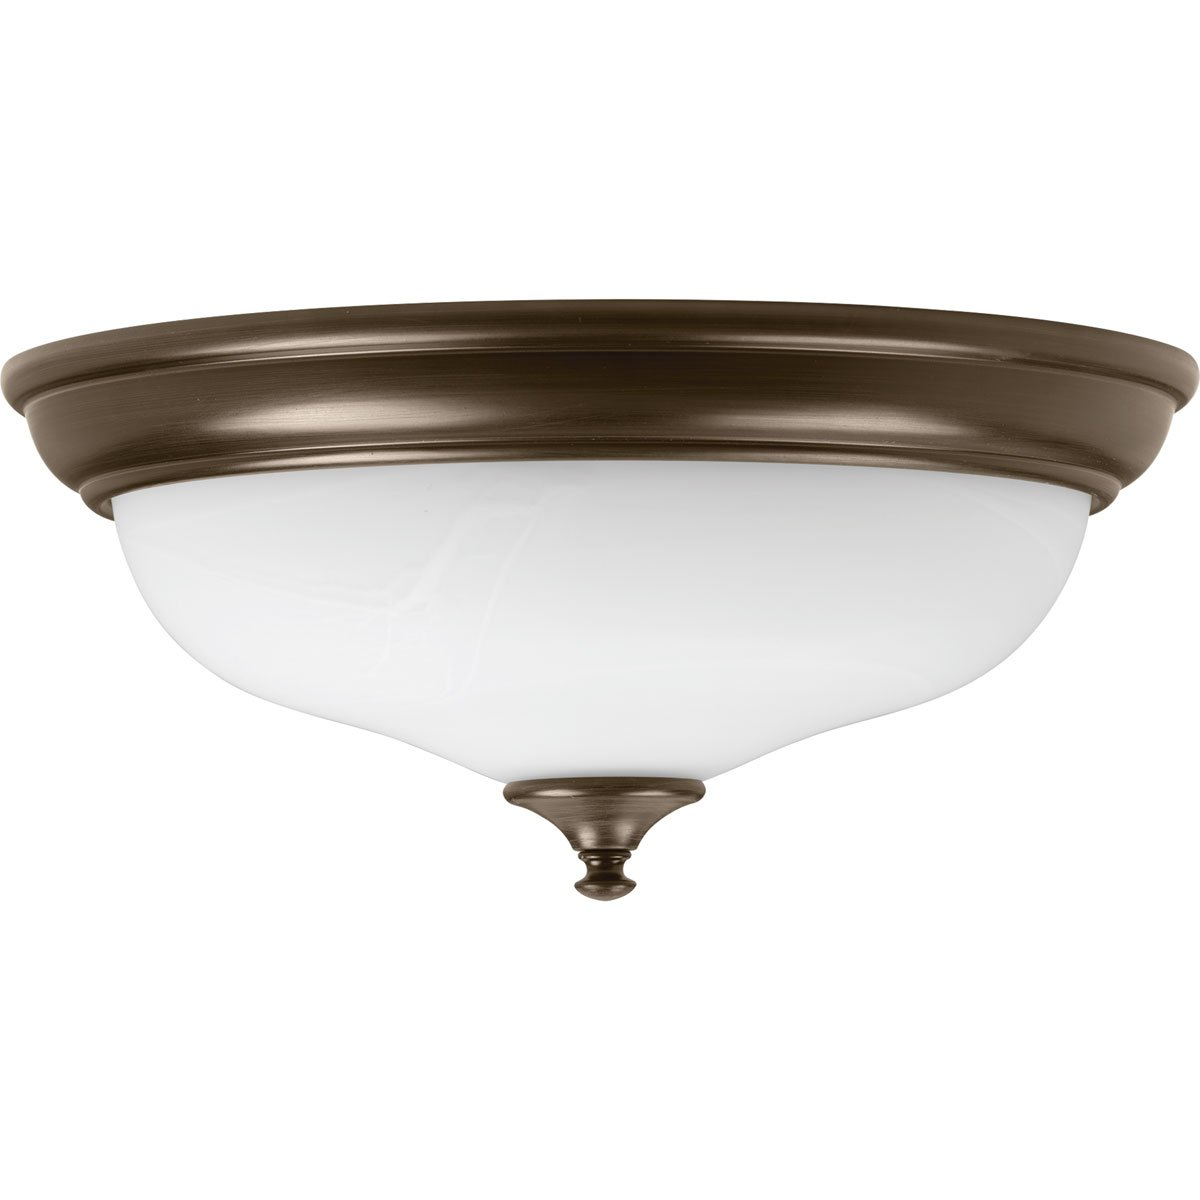 Antique Bronze Progress Lighting P350003-020-30 Alabaster One-Light DC LED Flush Mount